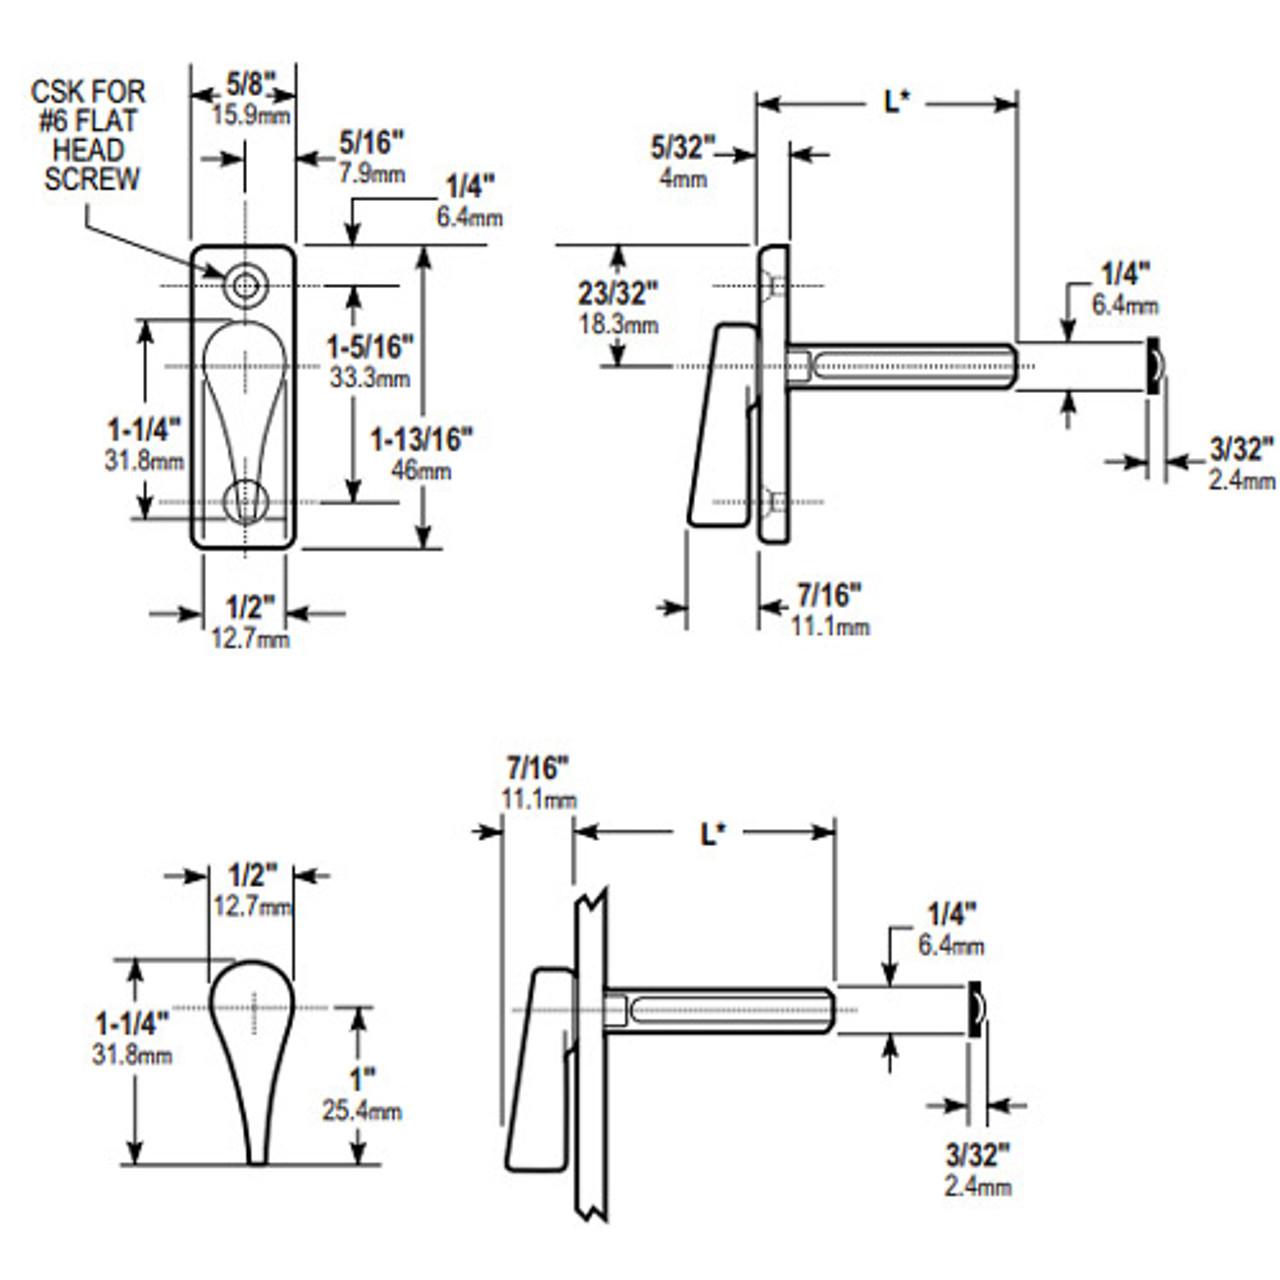 1000-21-17-130 Adams Rite 1000 Series Turns Dimensional View